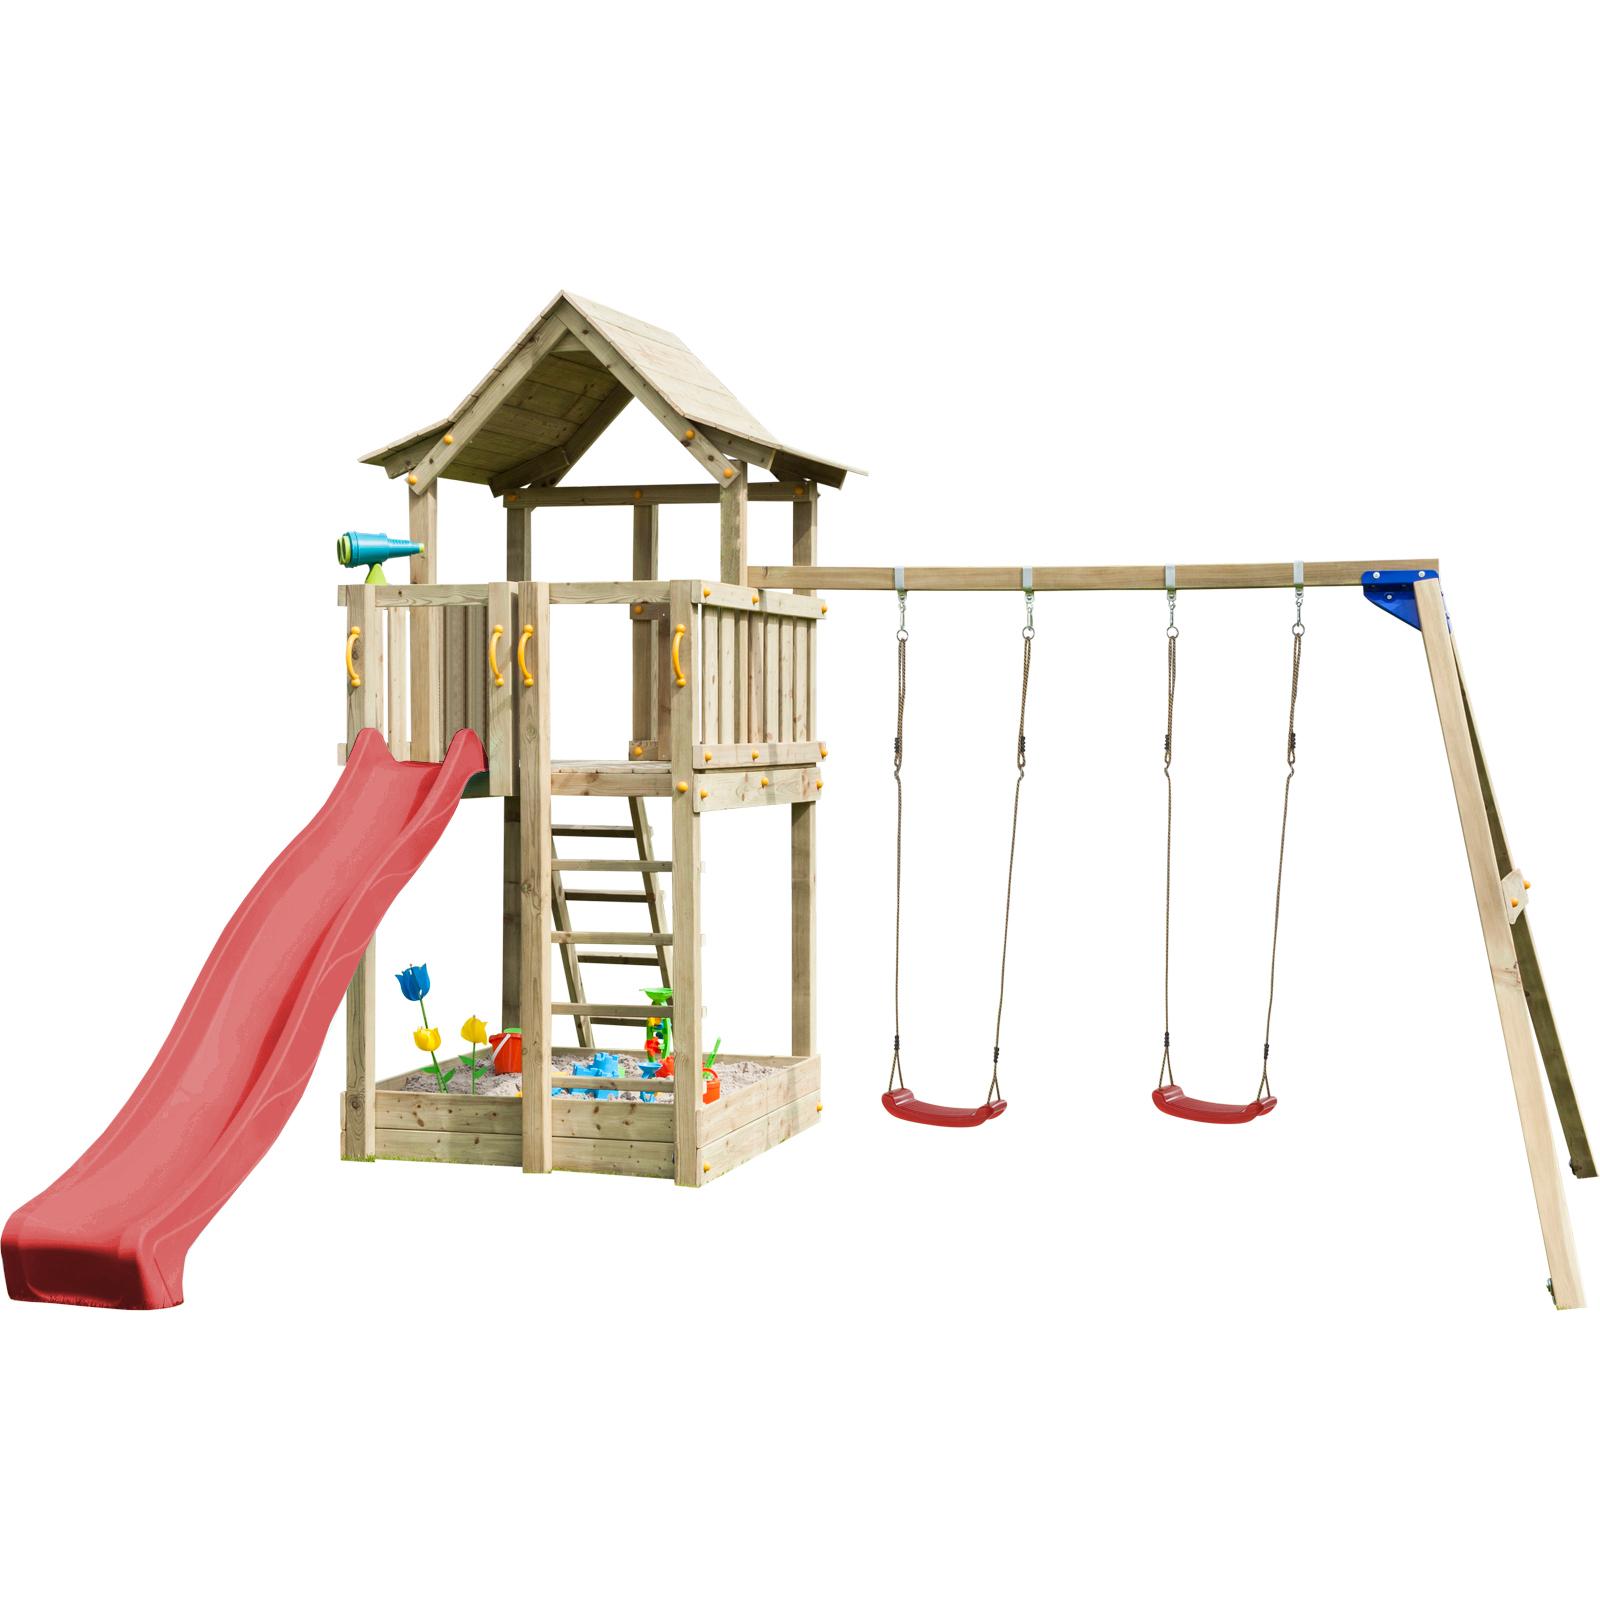 blue rabbit spielturm pagoda mit rutsche 2 90 m. Black Bedroom Furniture Sets. Home Design Ideas